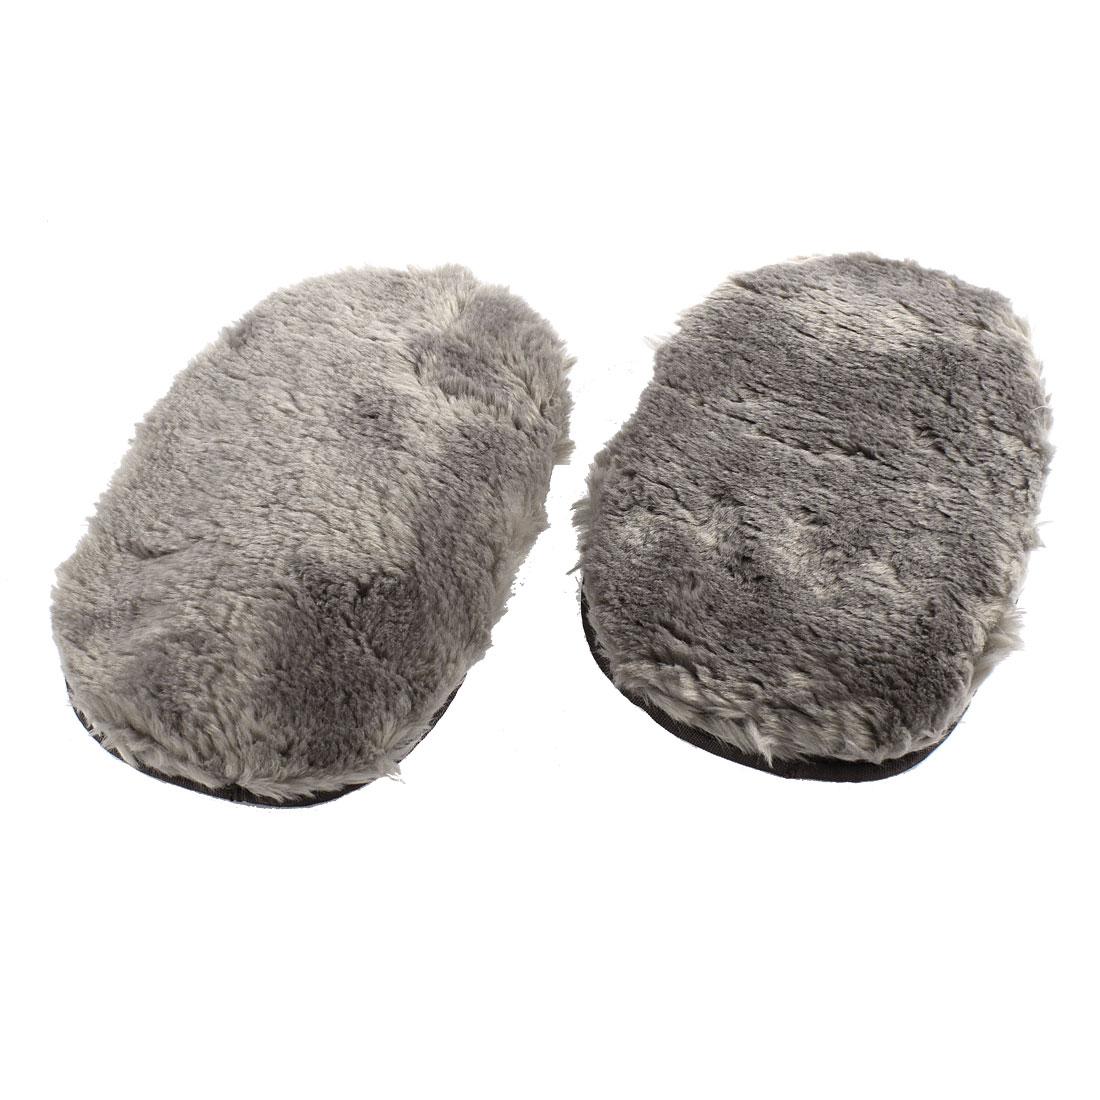 Pair Gray Plush Duster Towel Car Window Washing Cleaning Gloves Cloth Mitt